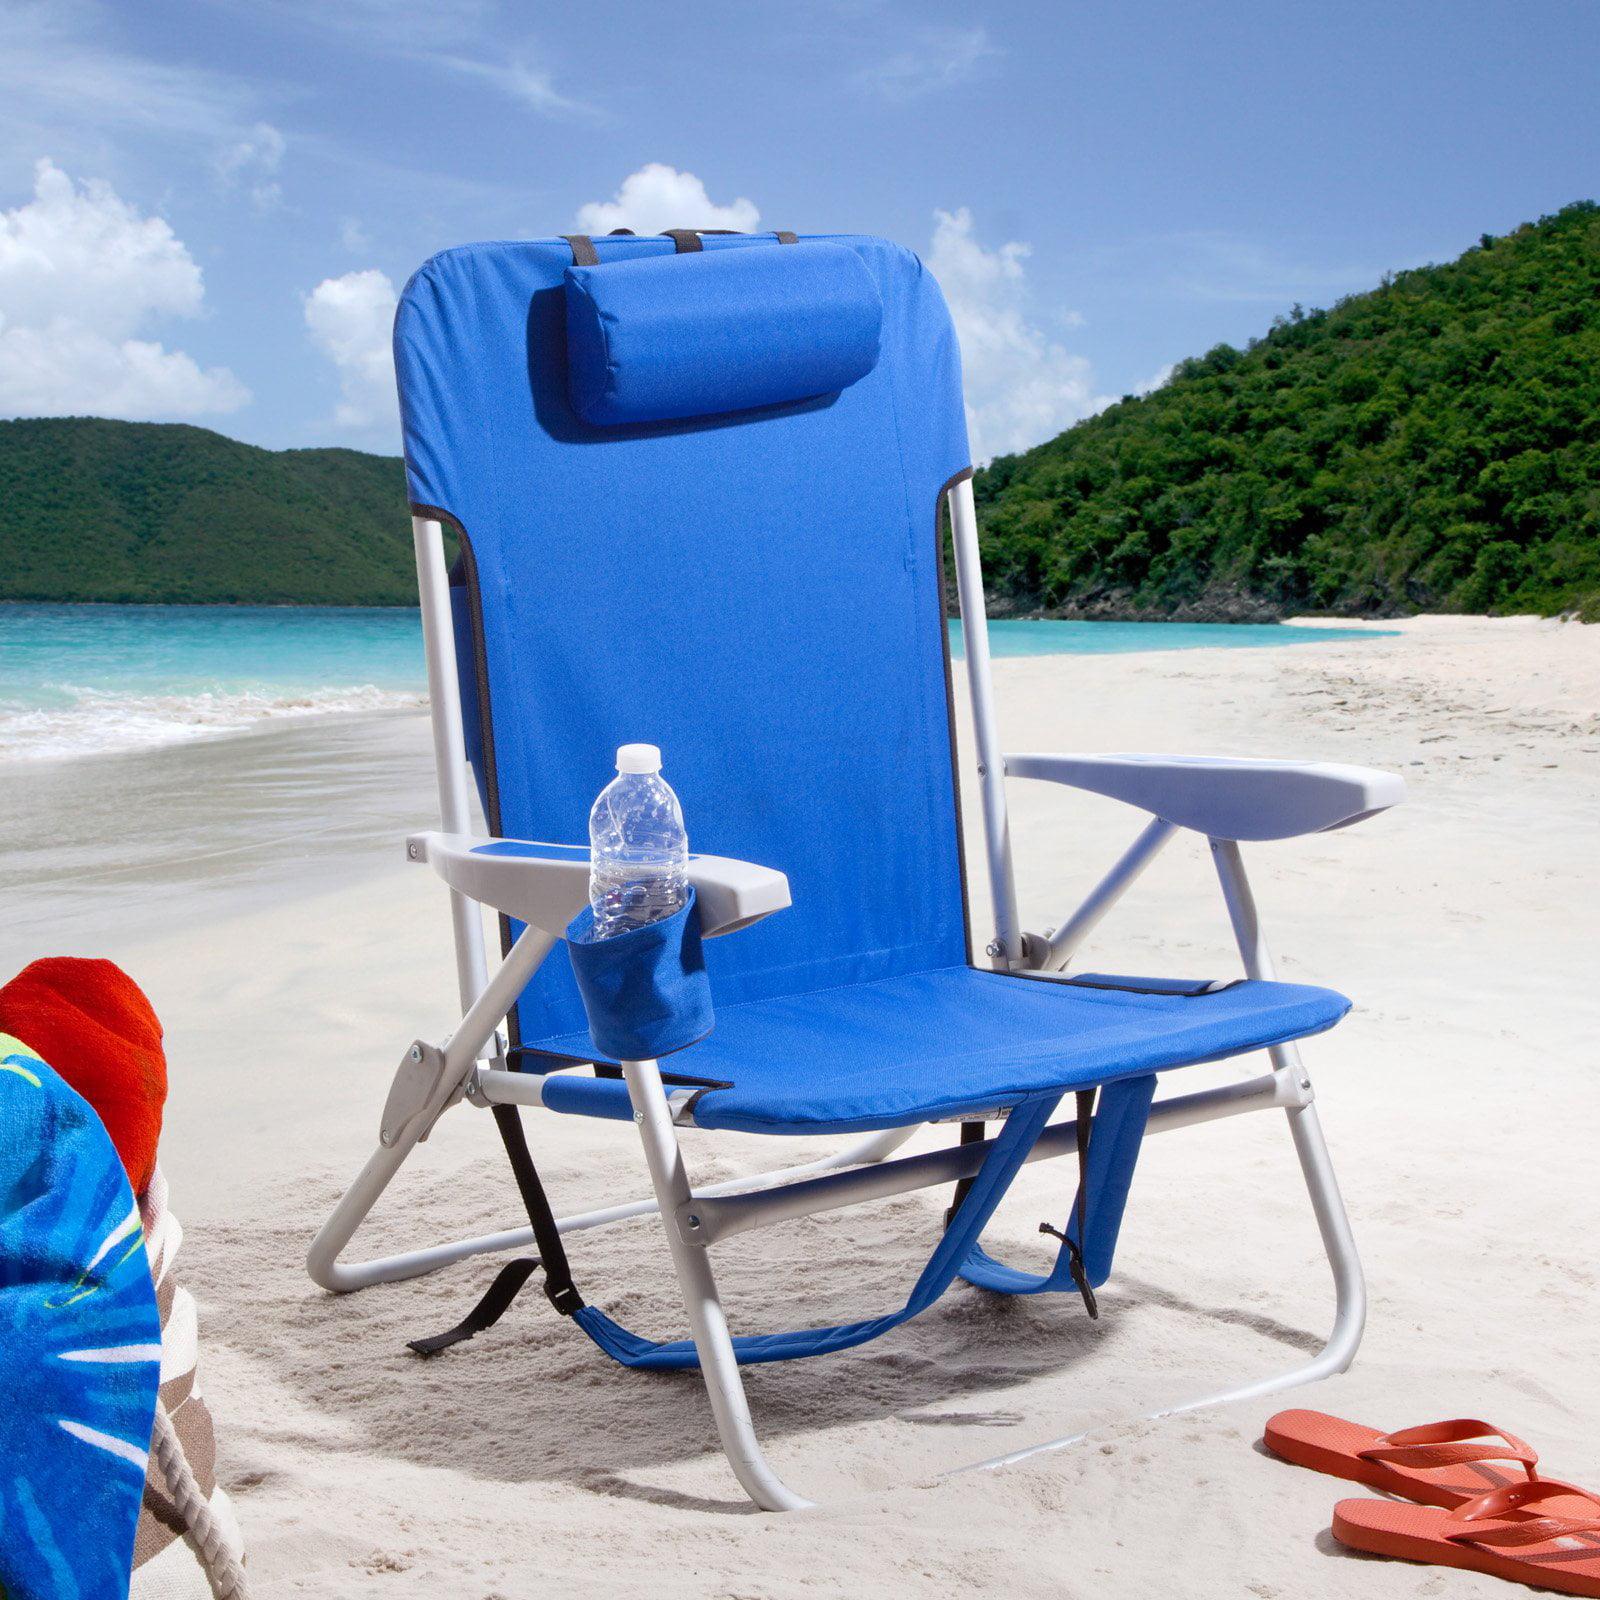 rio extra wide backpack beach chair - walmart